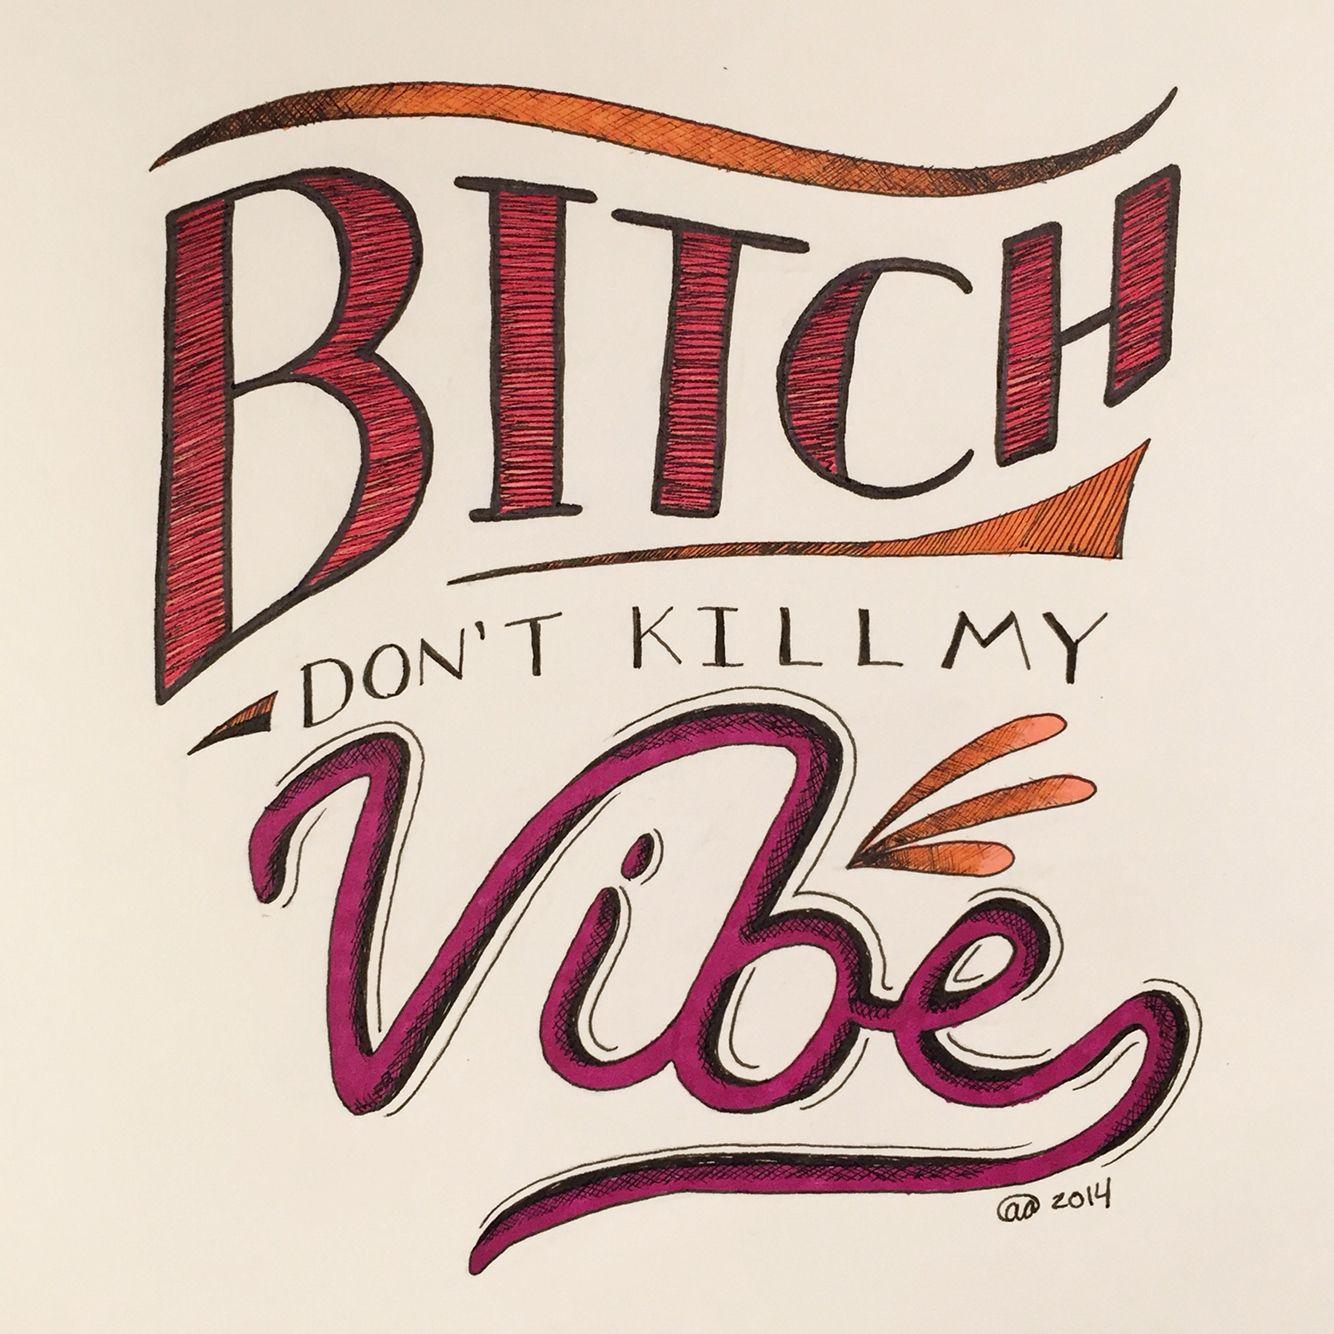 100 days of typography, day 78. Kendrick Lamar - Bitch, Don't Kill My Vibe. #typography #illustration #art #design #lyrics #lettering